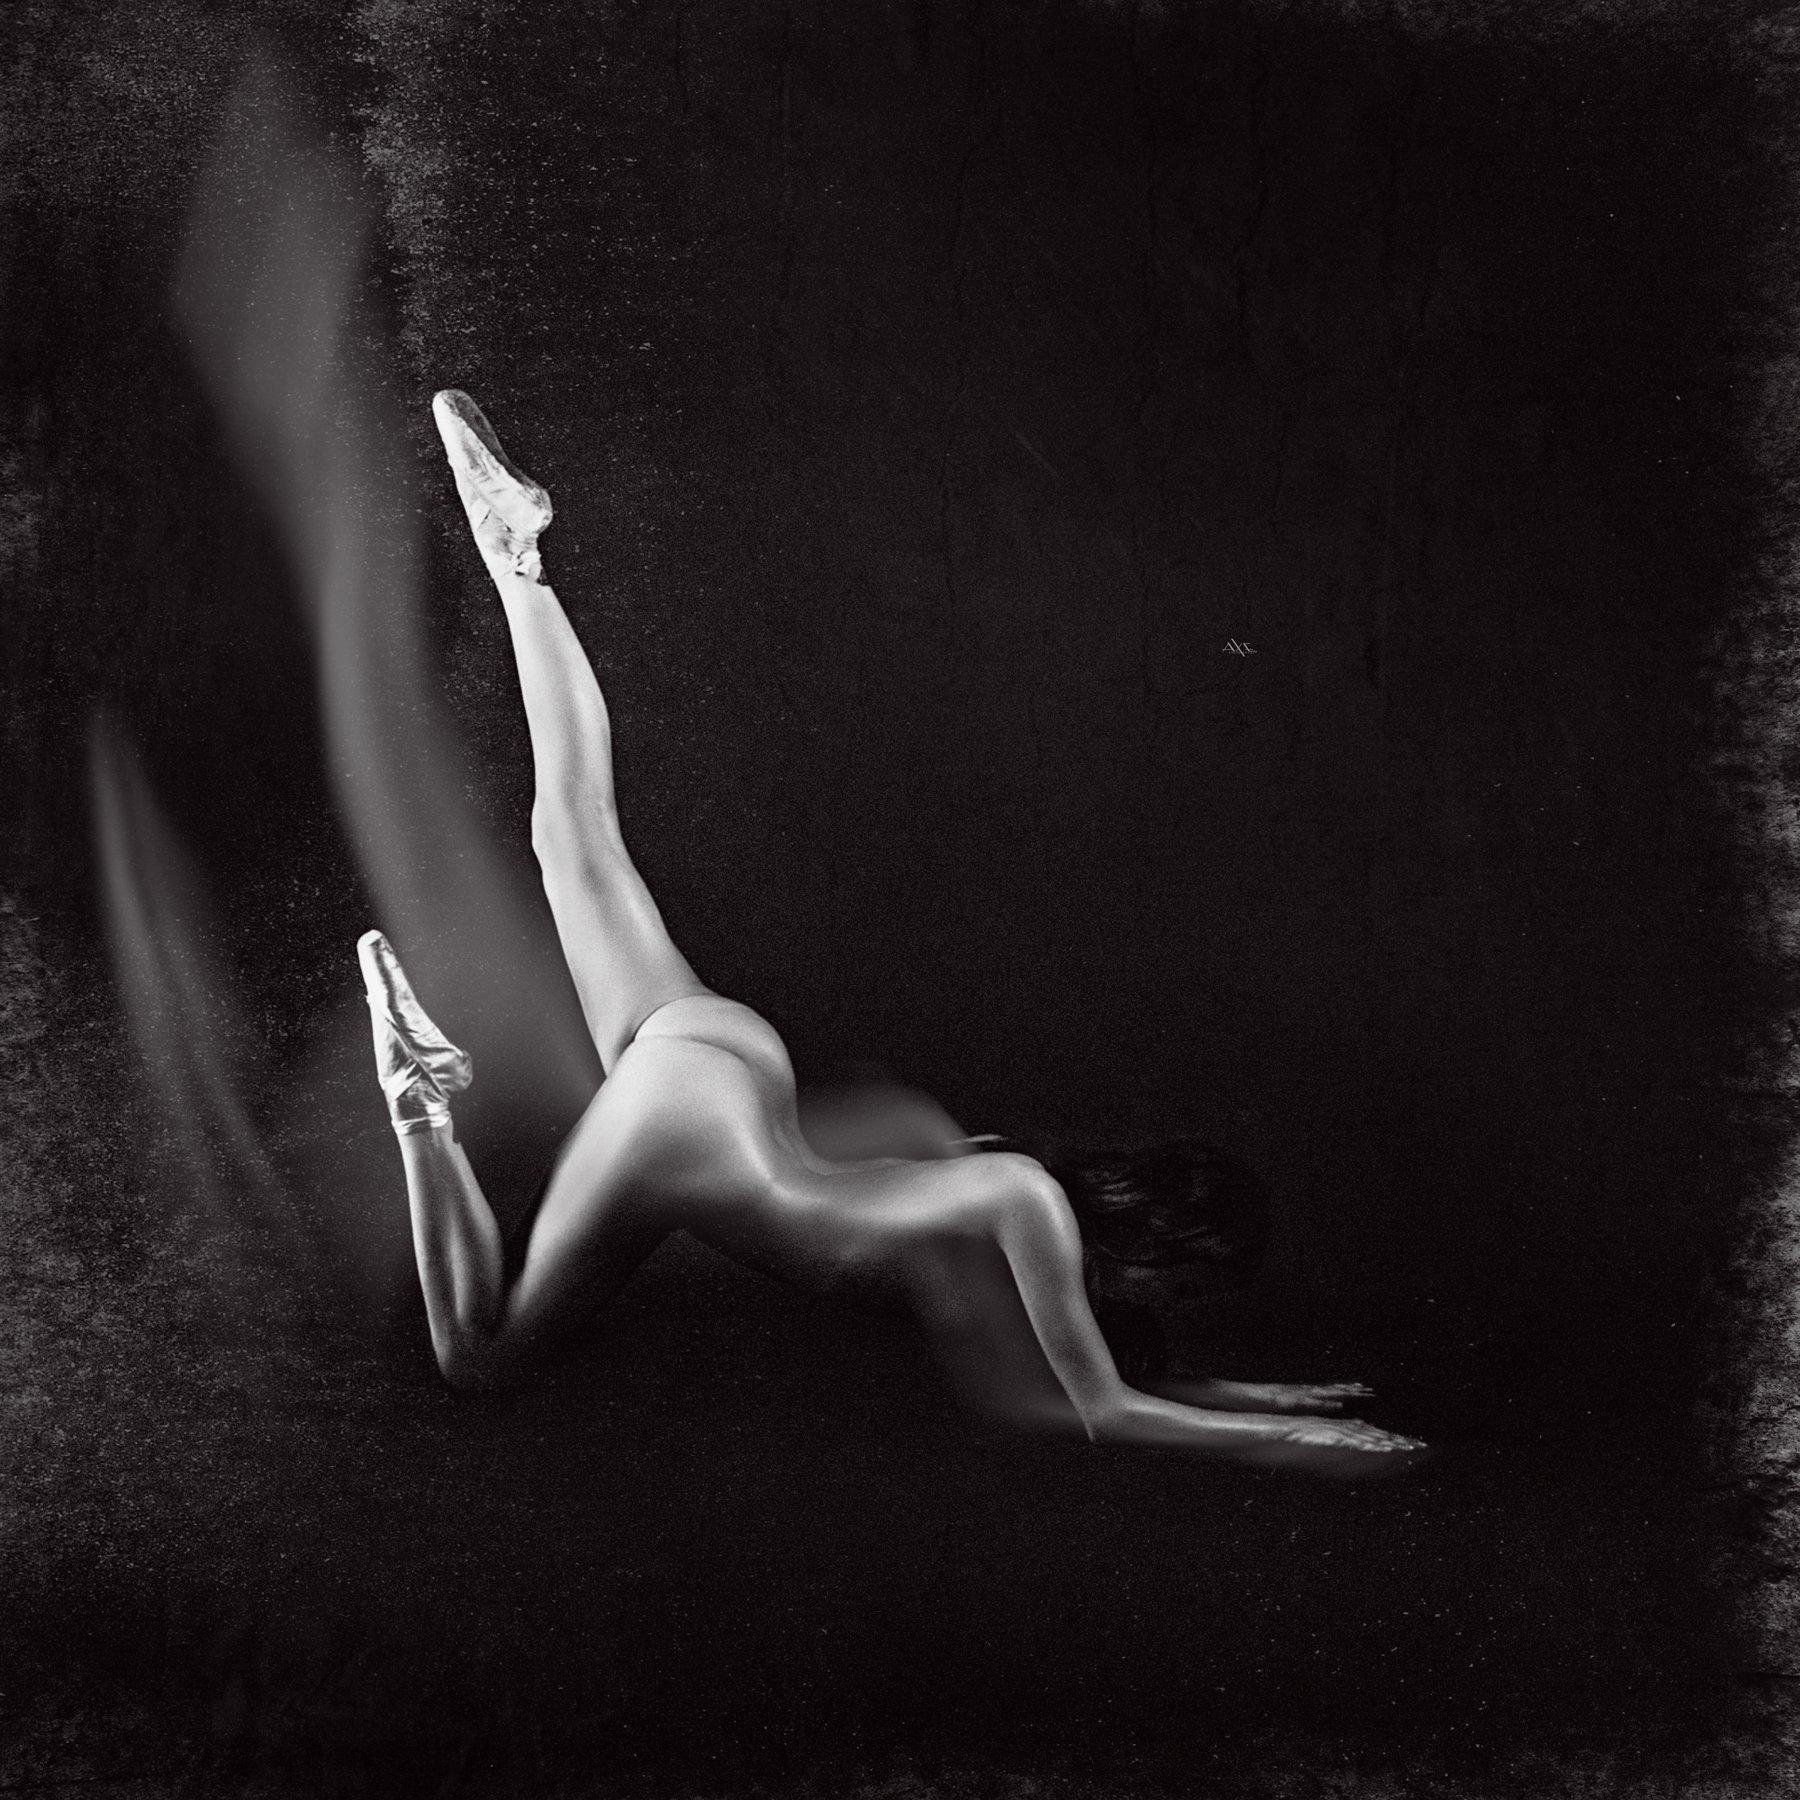 woman, ballerina, nude, black and white, Руслан Болгов (Axe)